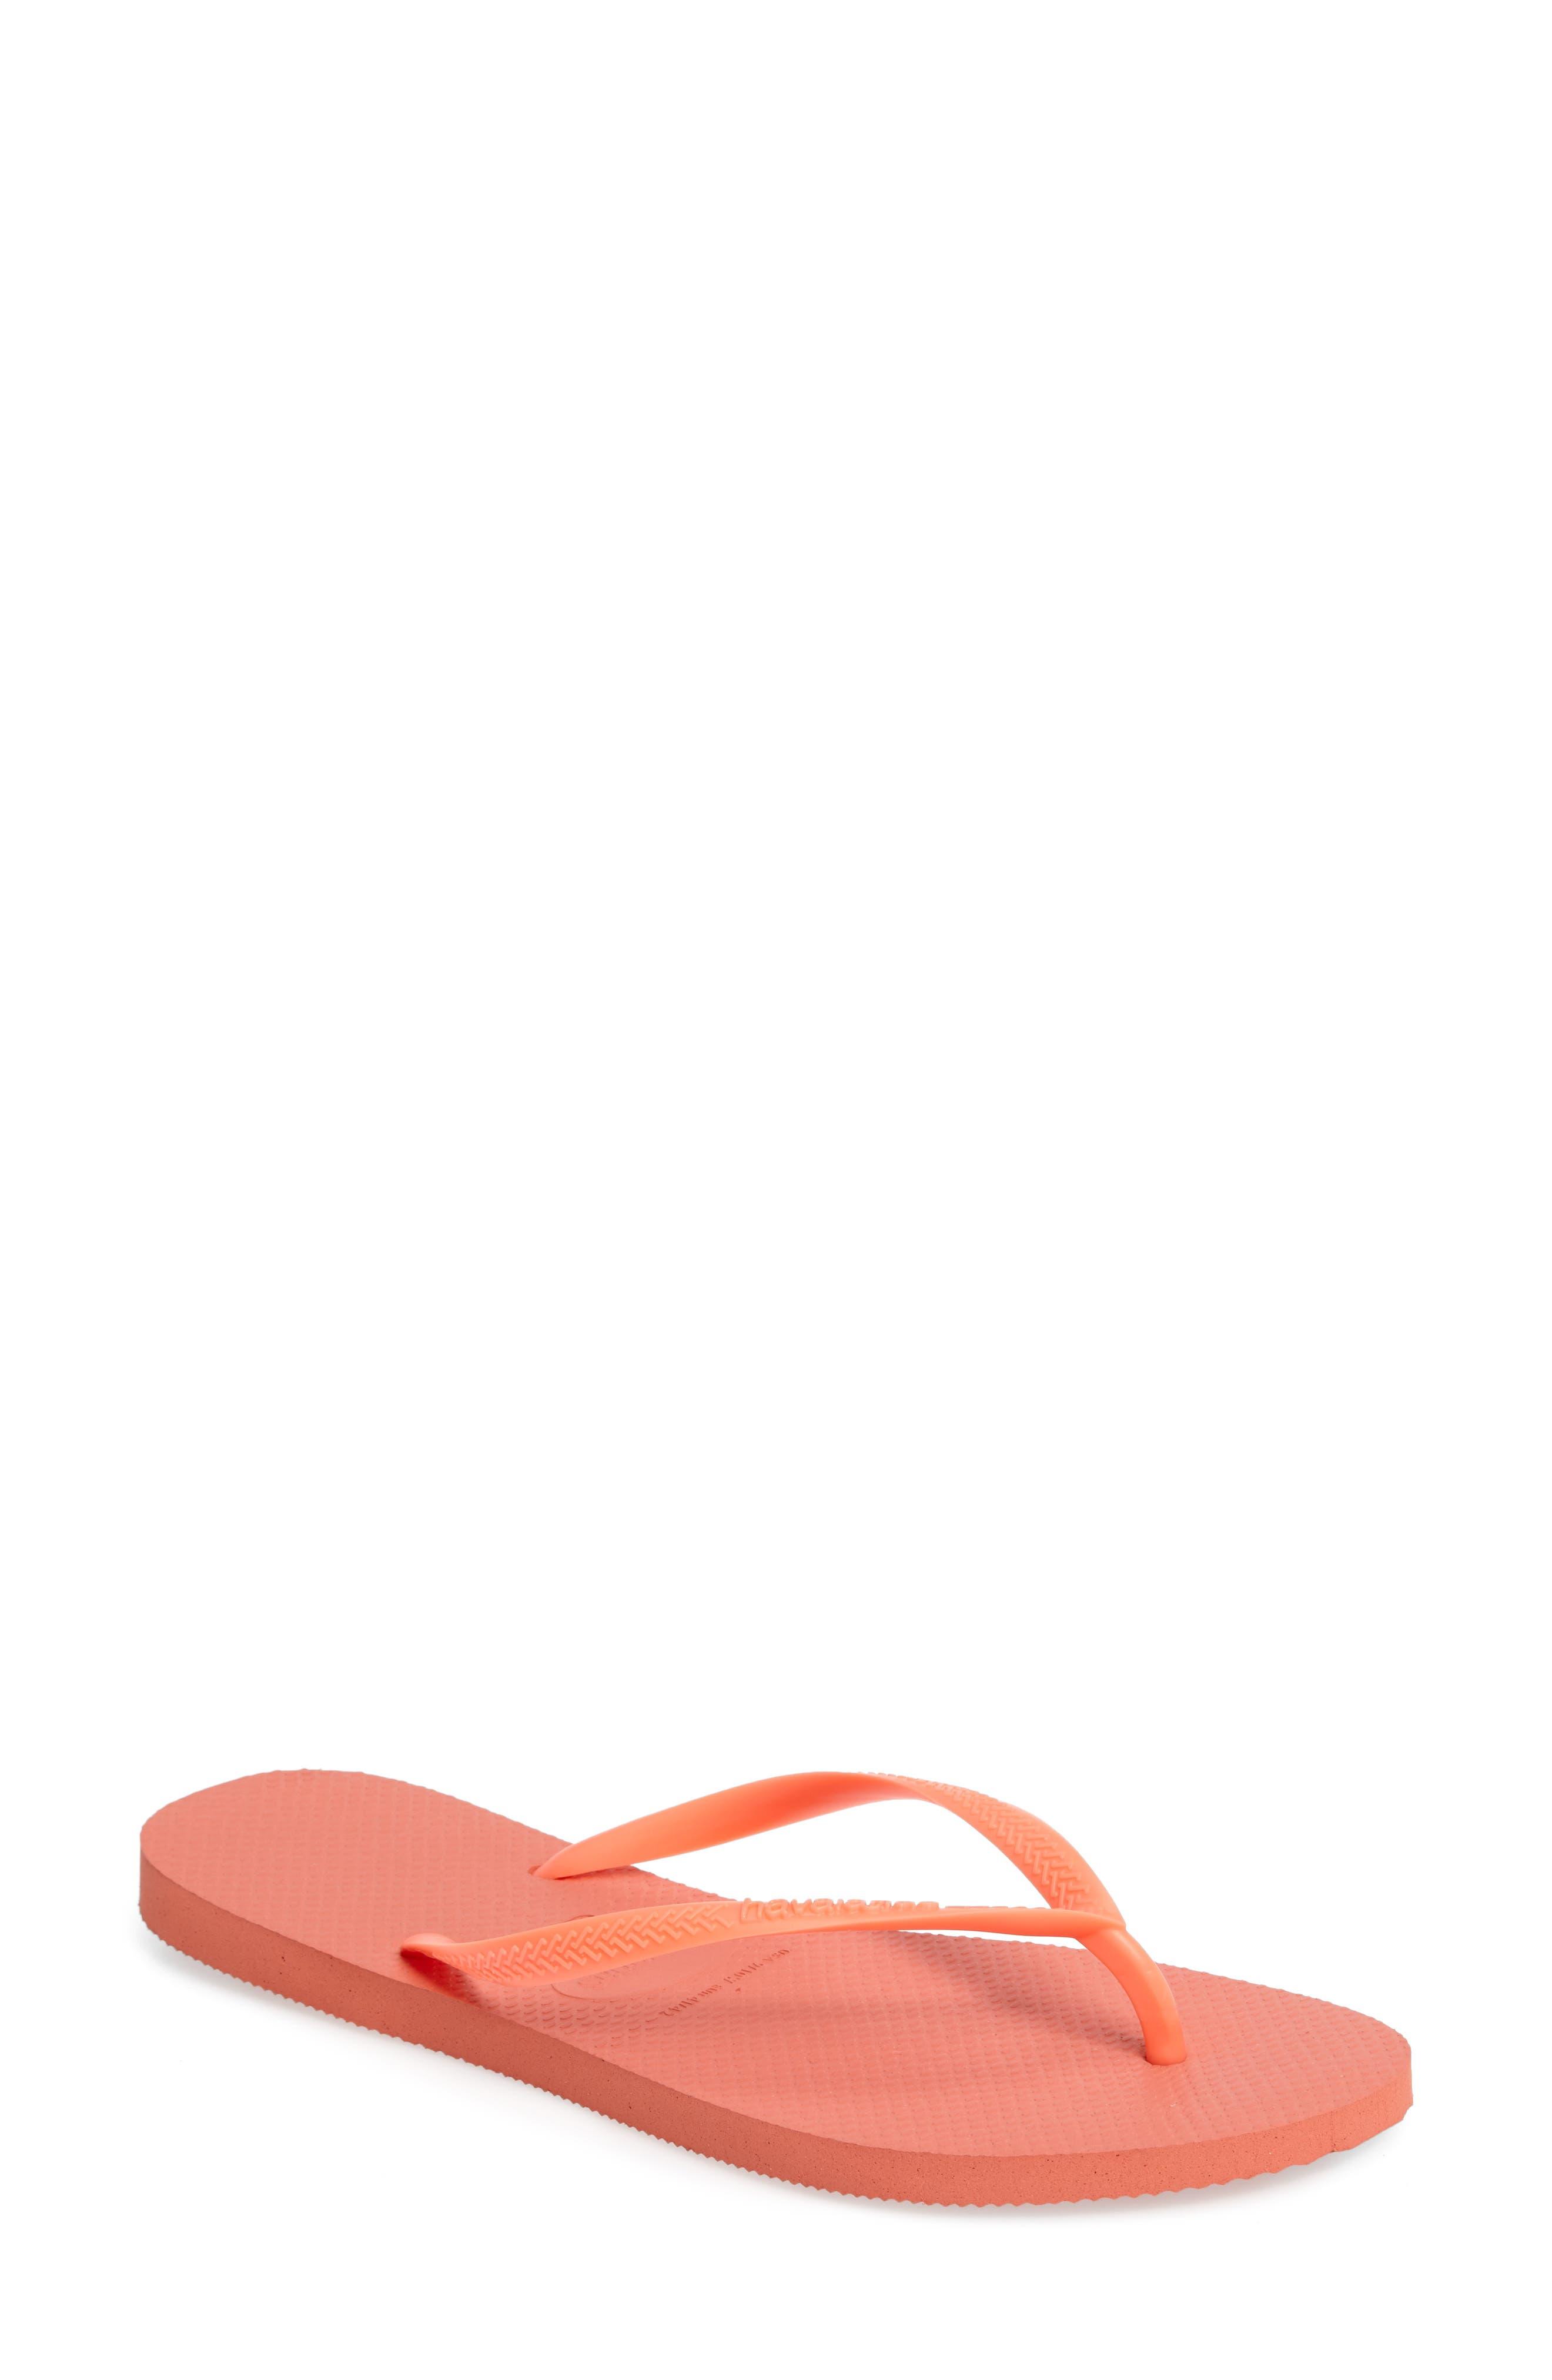 Main Image - Havaianas 'Slim' Flip Flop (Women)